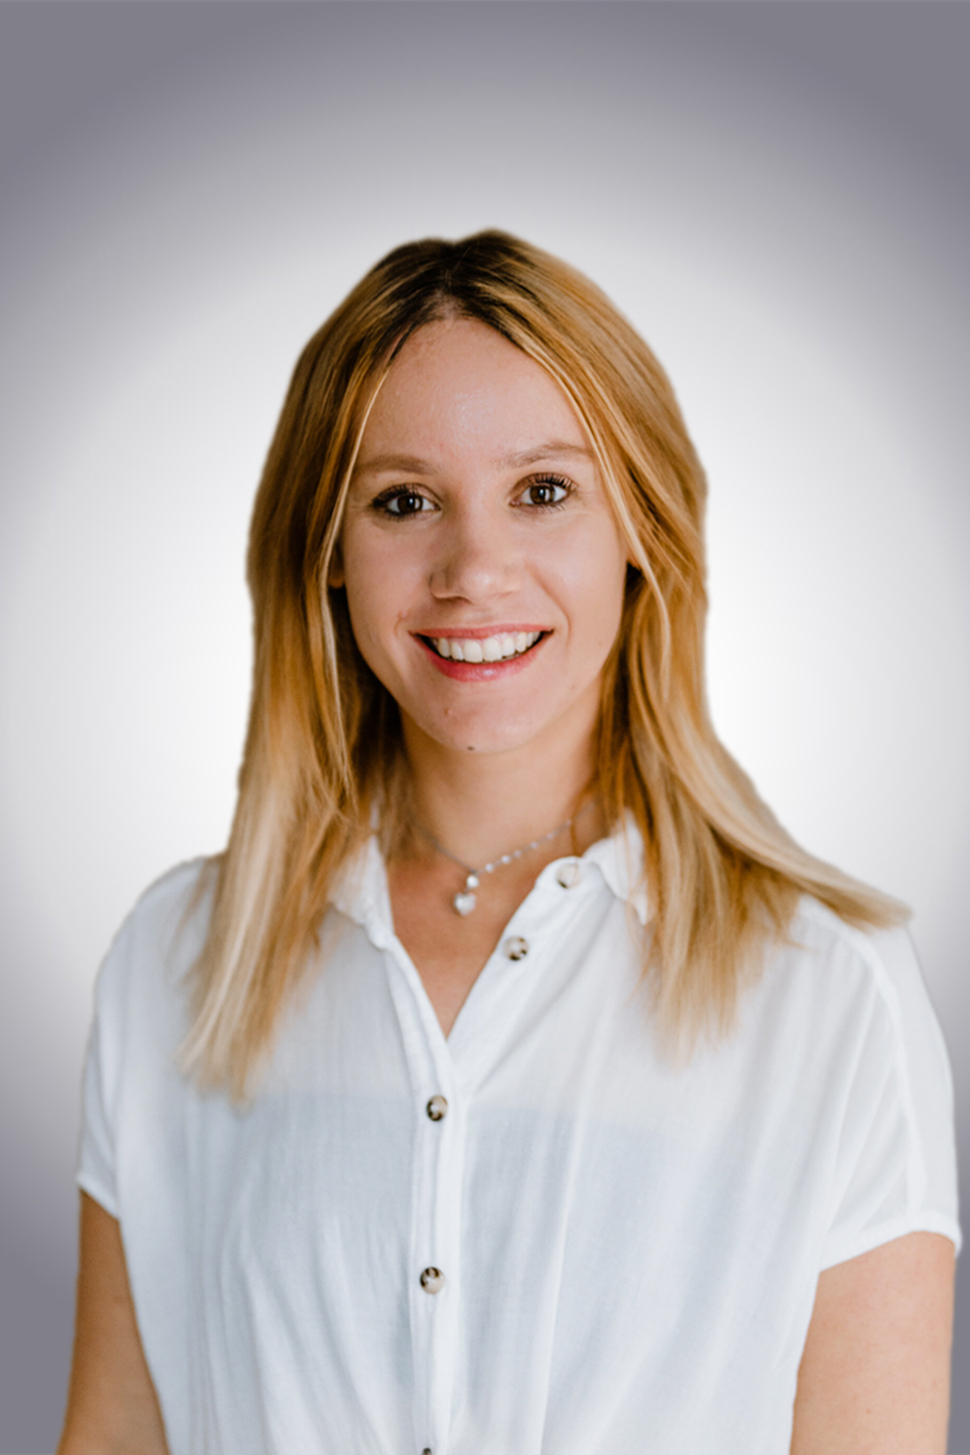 Kristina Bräuer